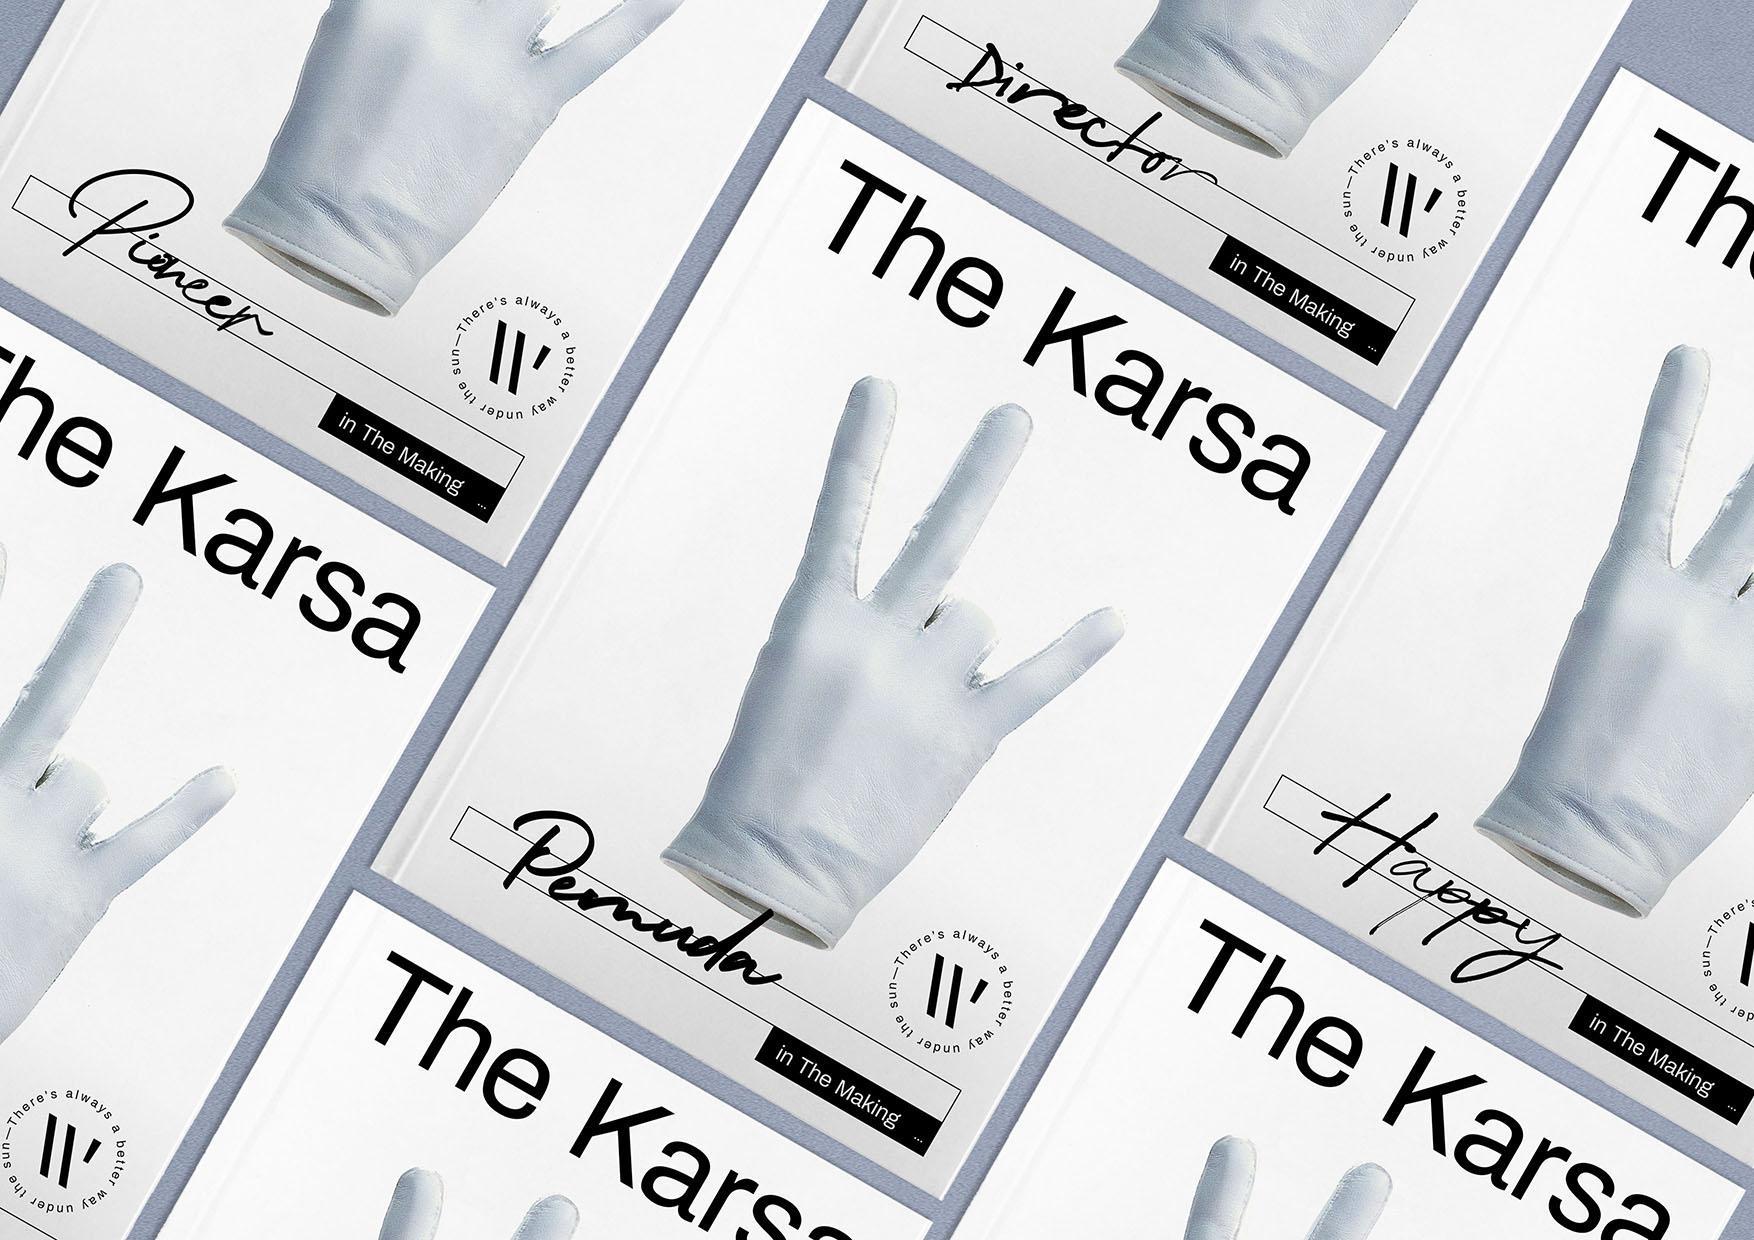 workbyw-the-karsa-book-01